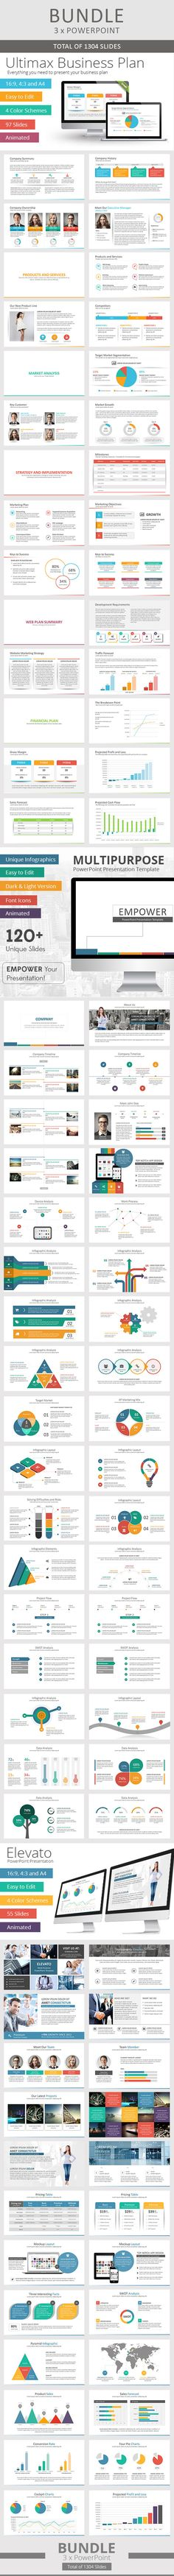 3 x Multi-Purpose PowerPoint Bundle - Total of 1304 slides!